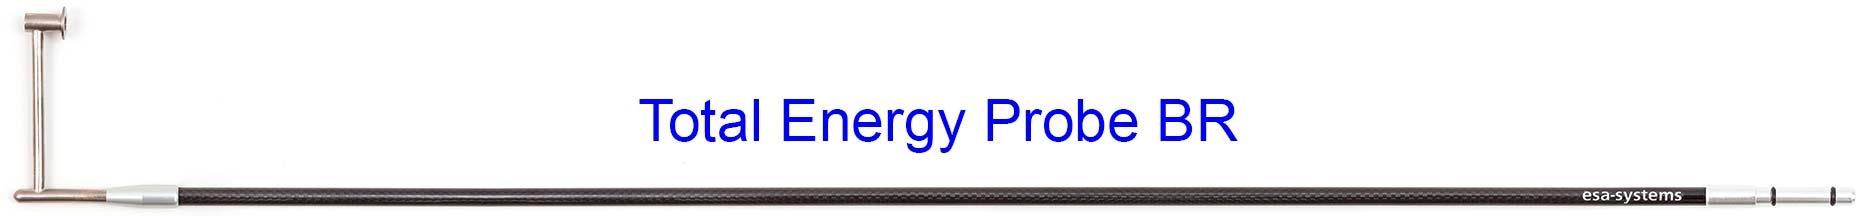 Total Energy Probe BR